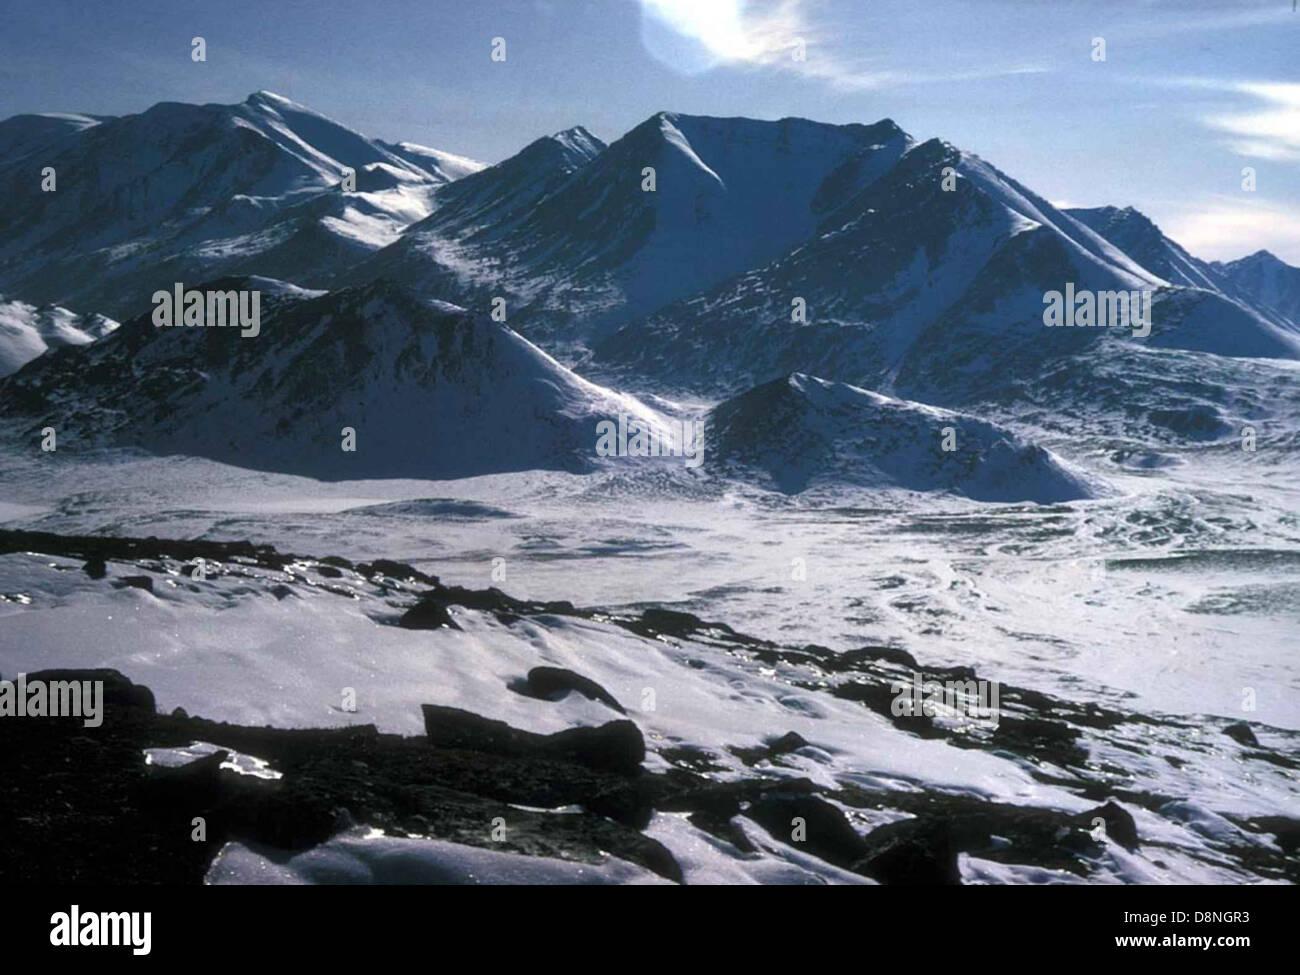 Winter scenics mountain at Peters lake. - Stock Image